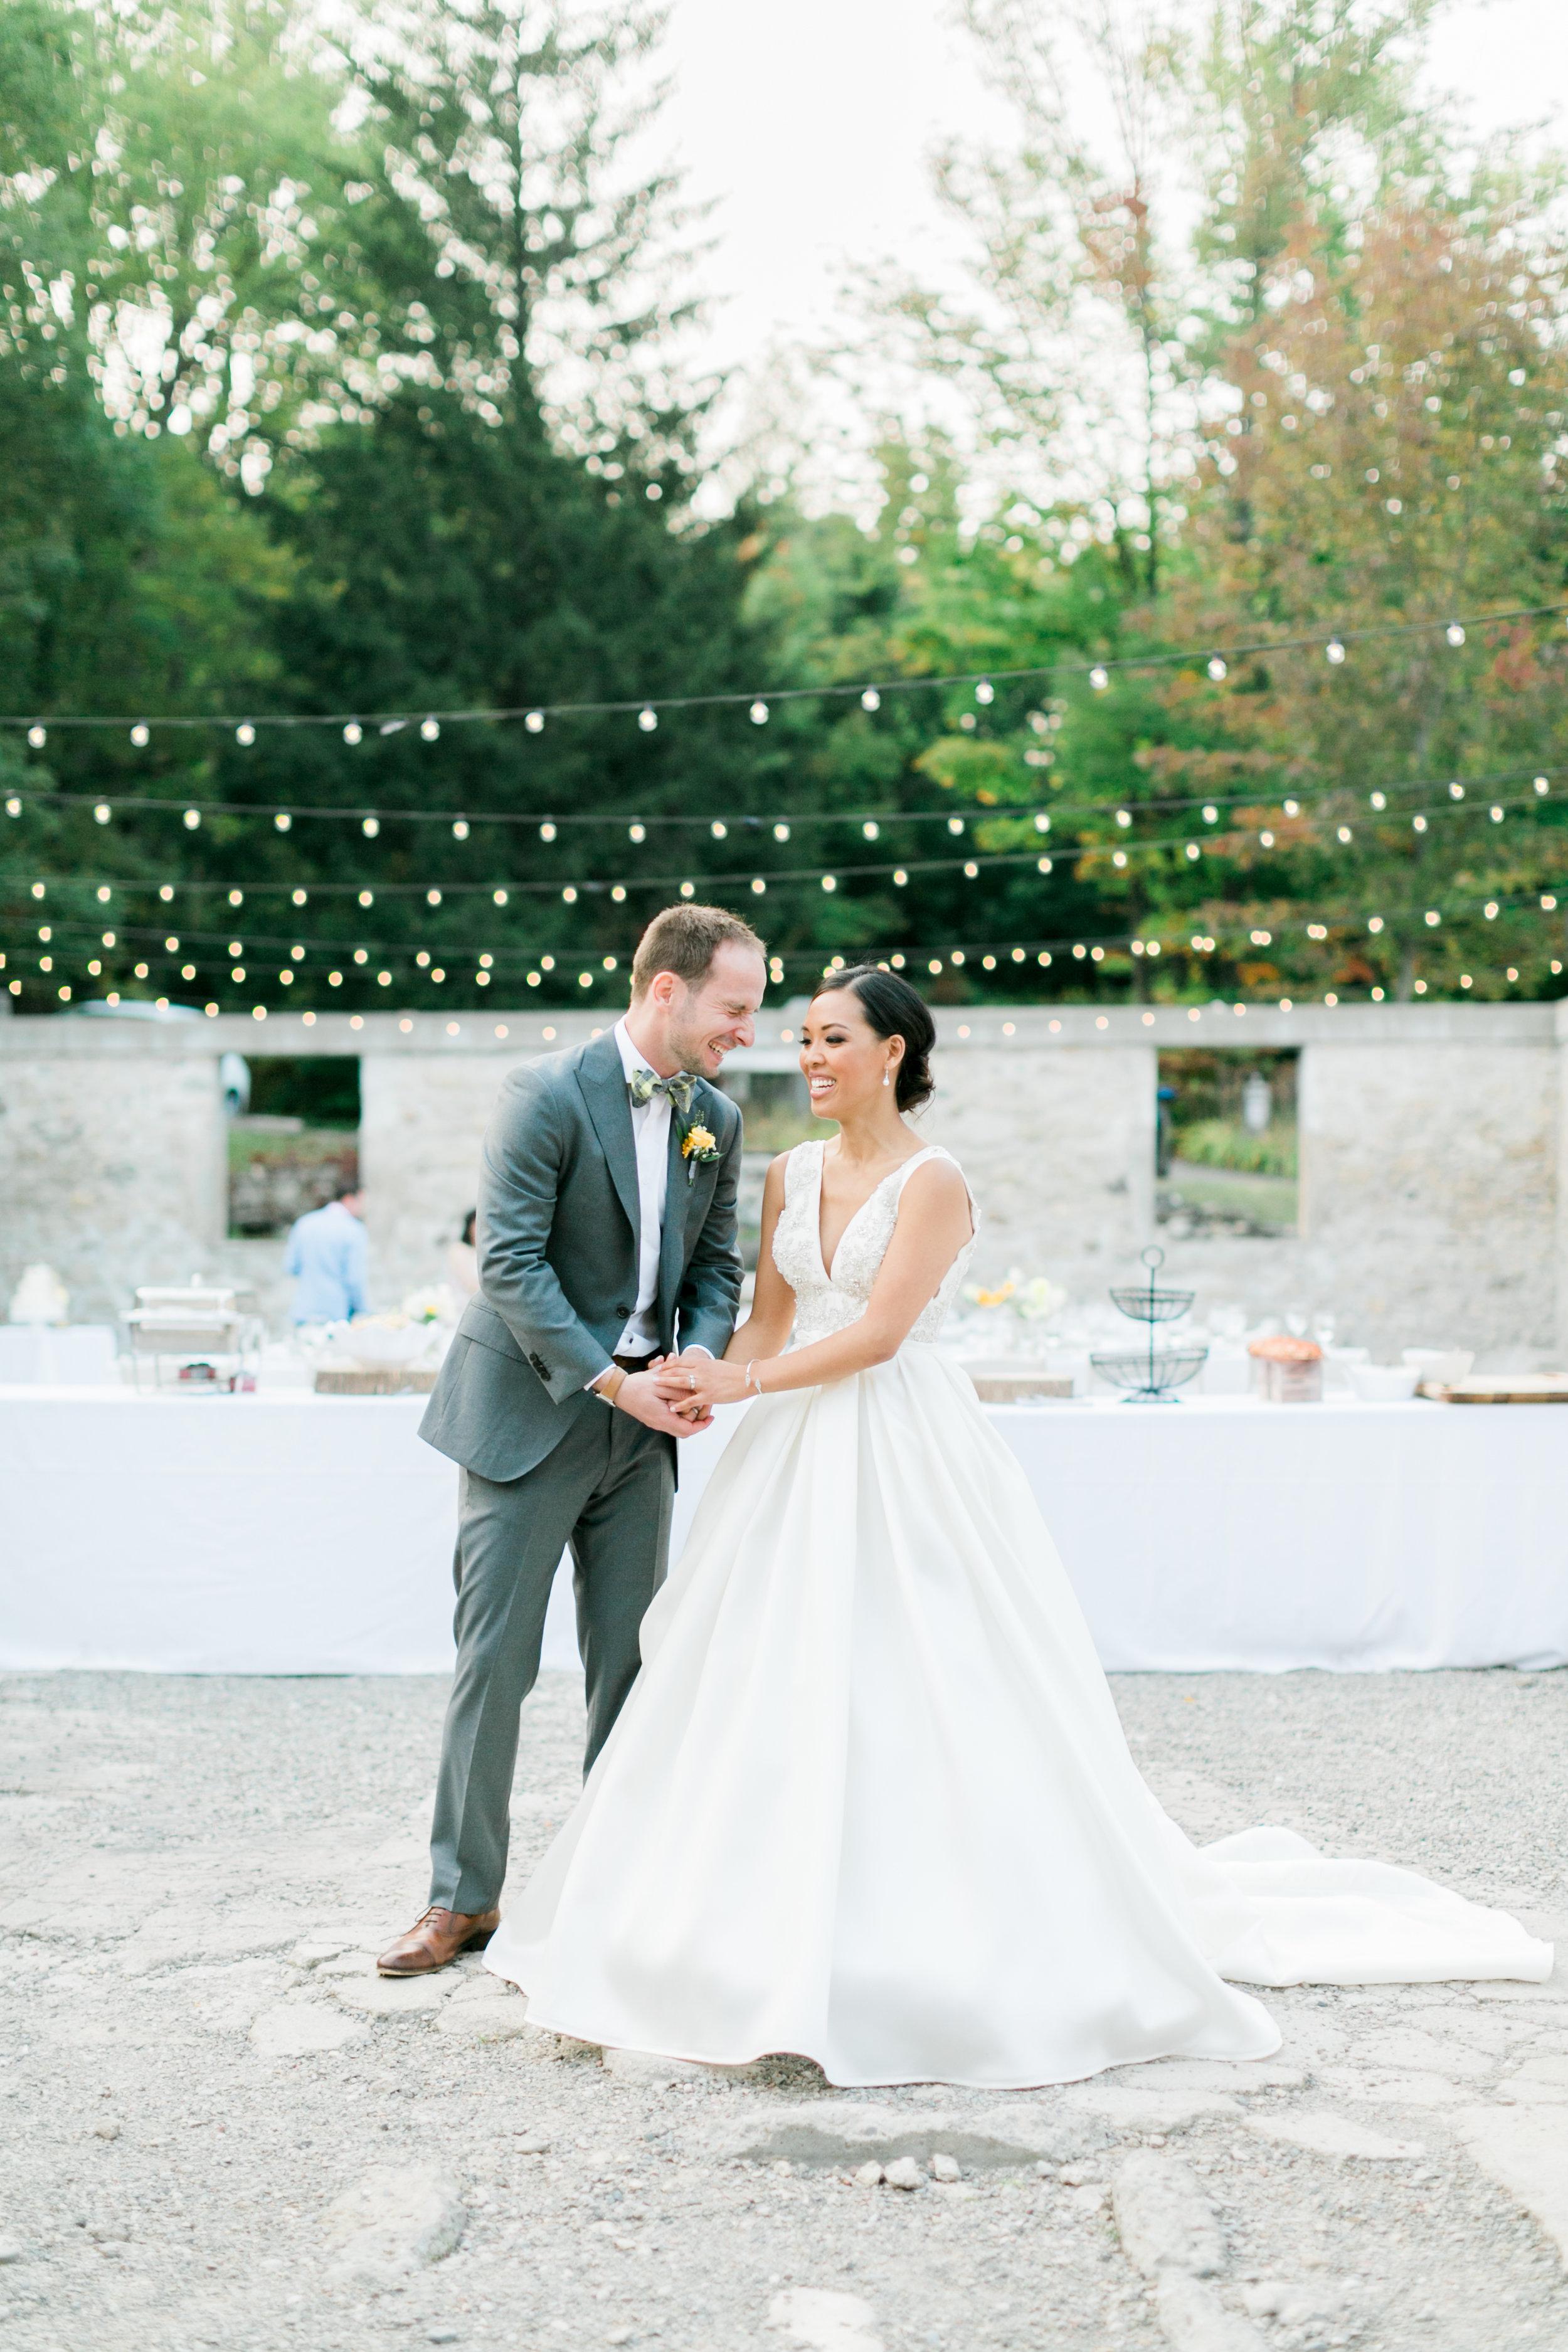 Alton Mills Wedding - Reception-17.jpg